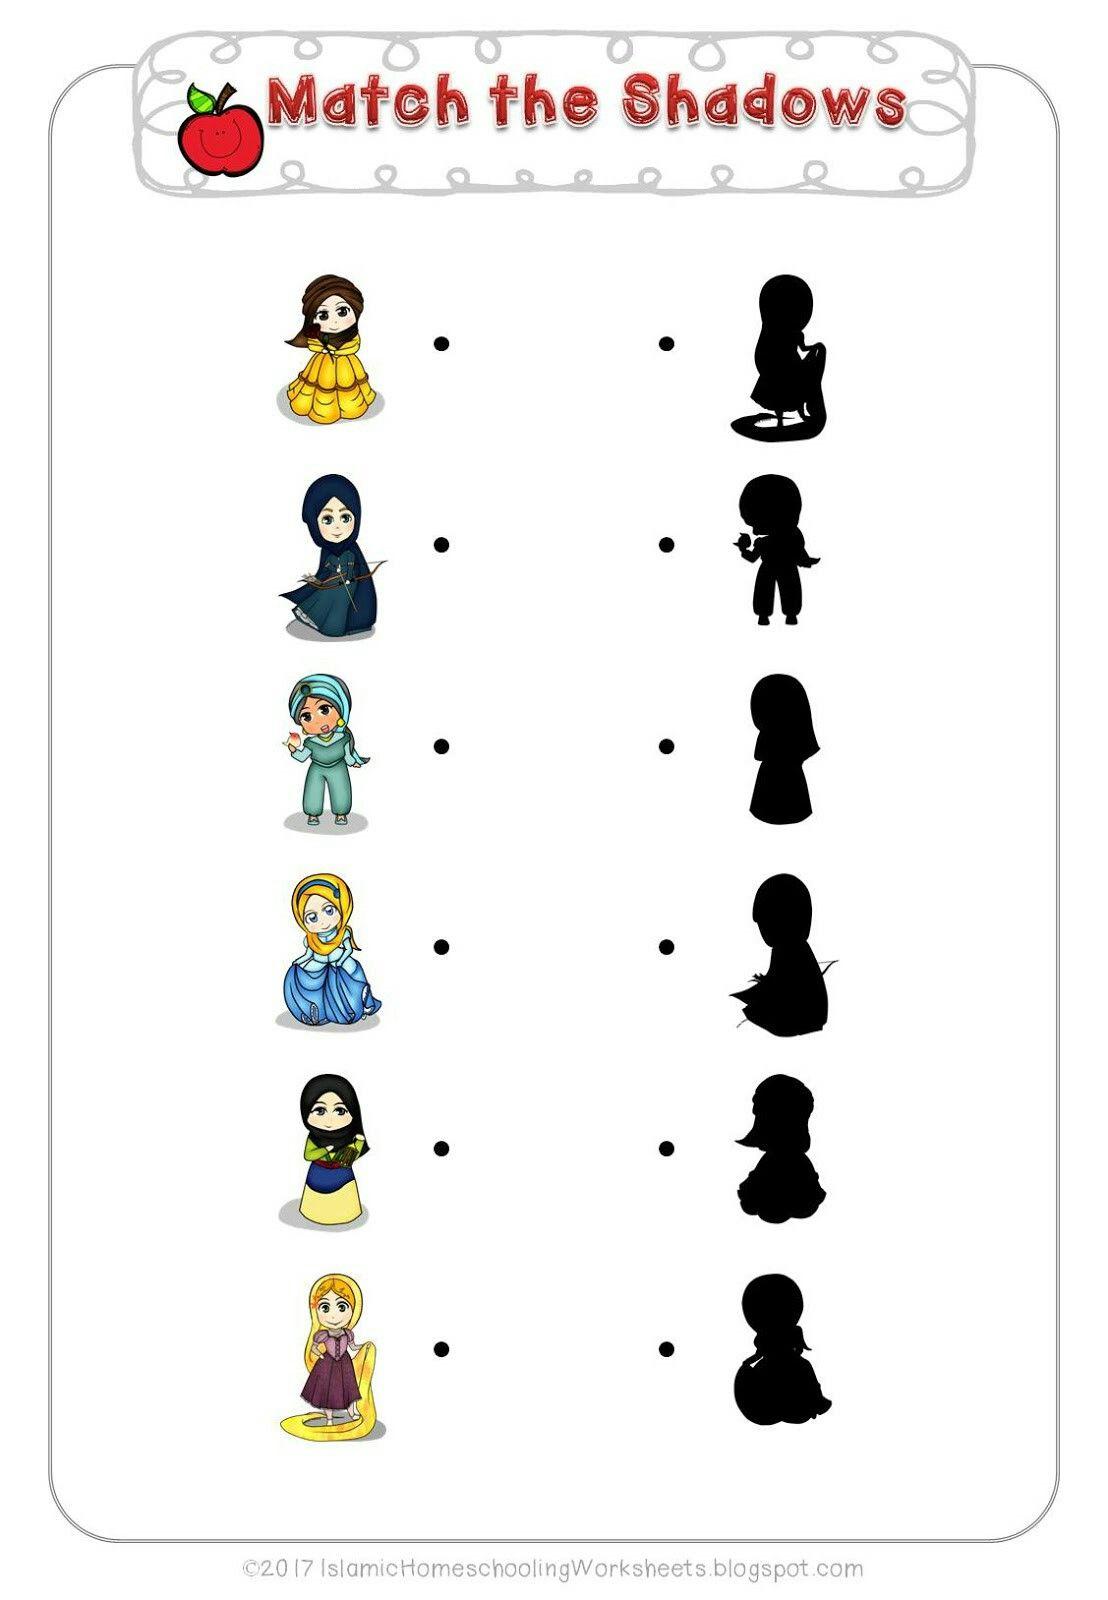 Worksheets Disney Worksheets match the shadows in free disney princess preschool pack islamic version petite section disney